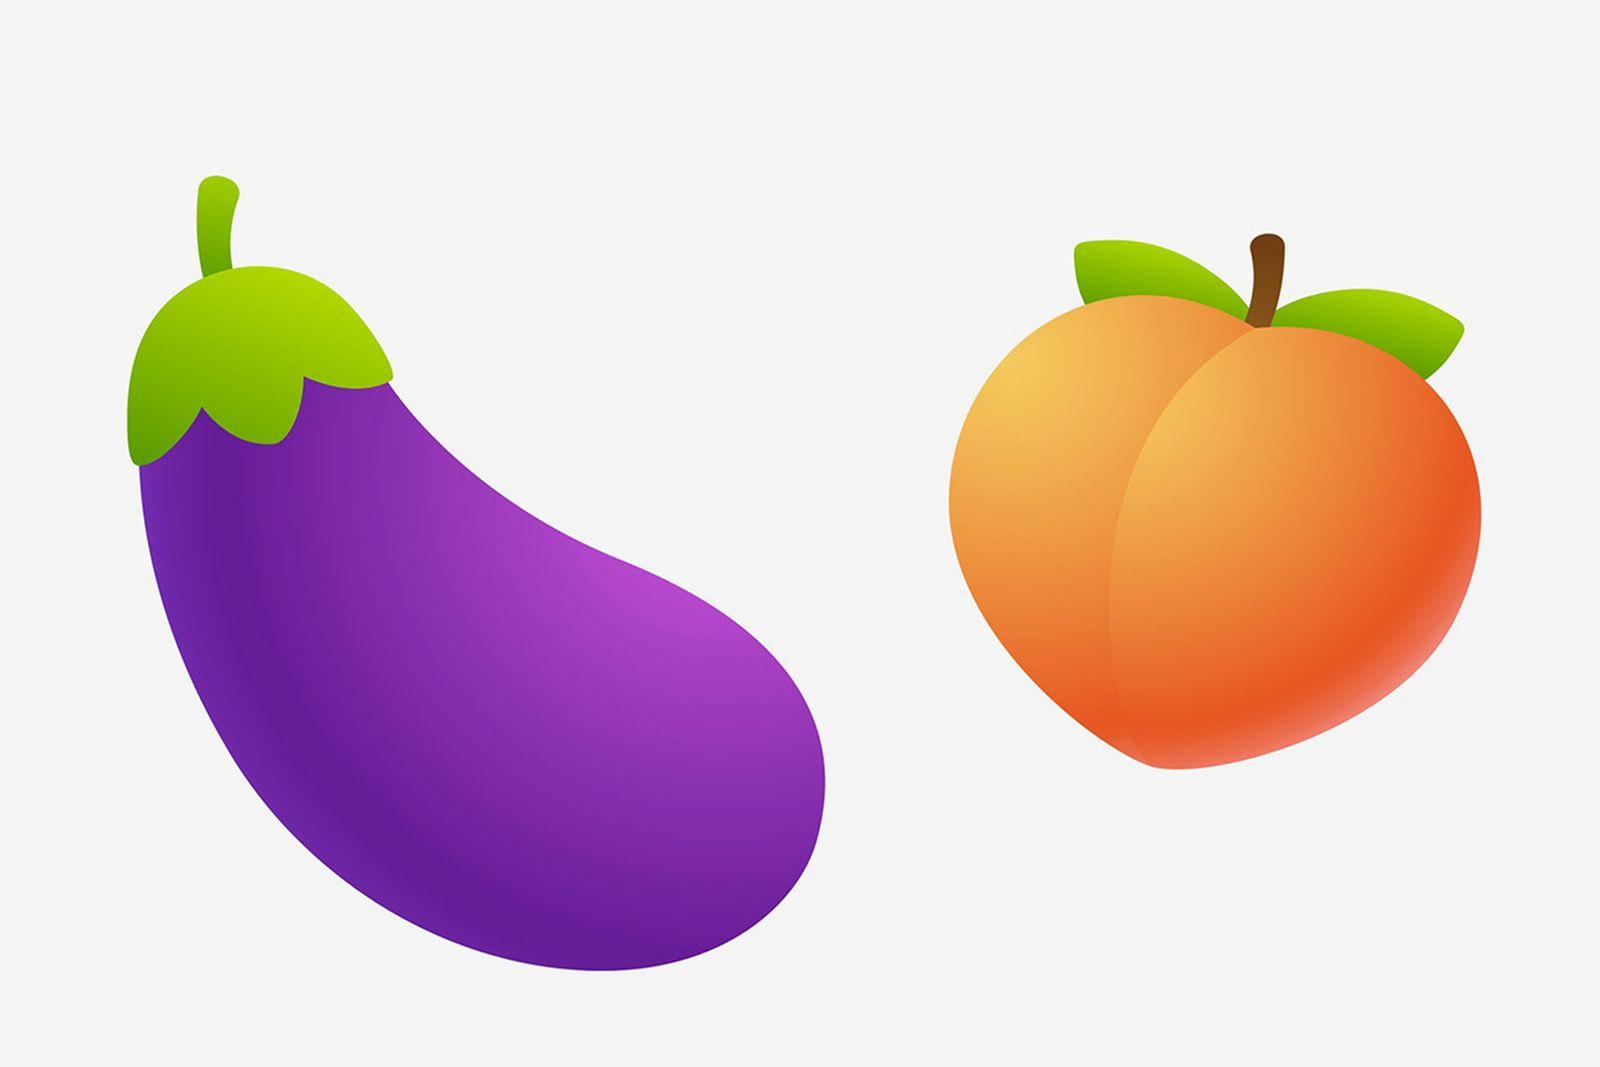 eggplant emoji peach emoji